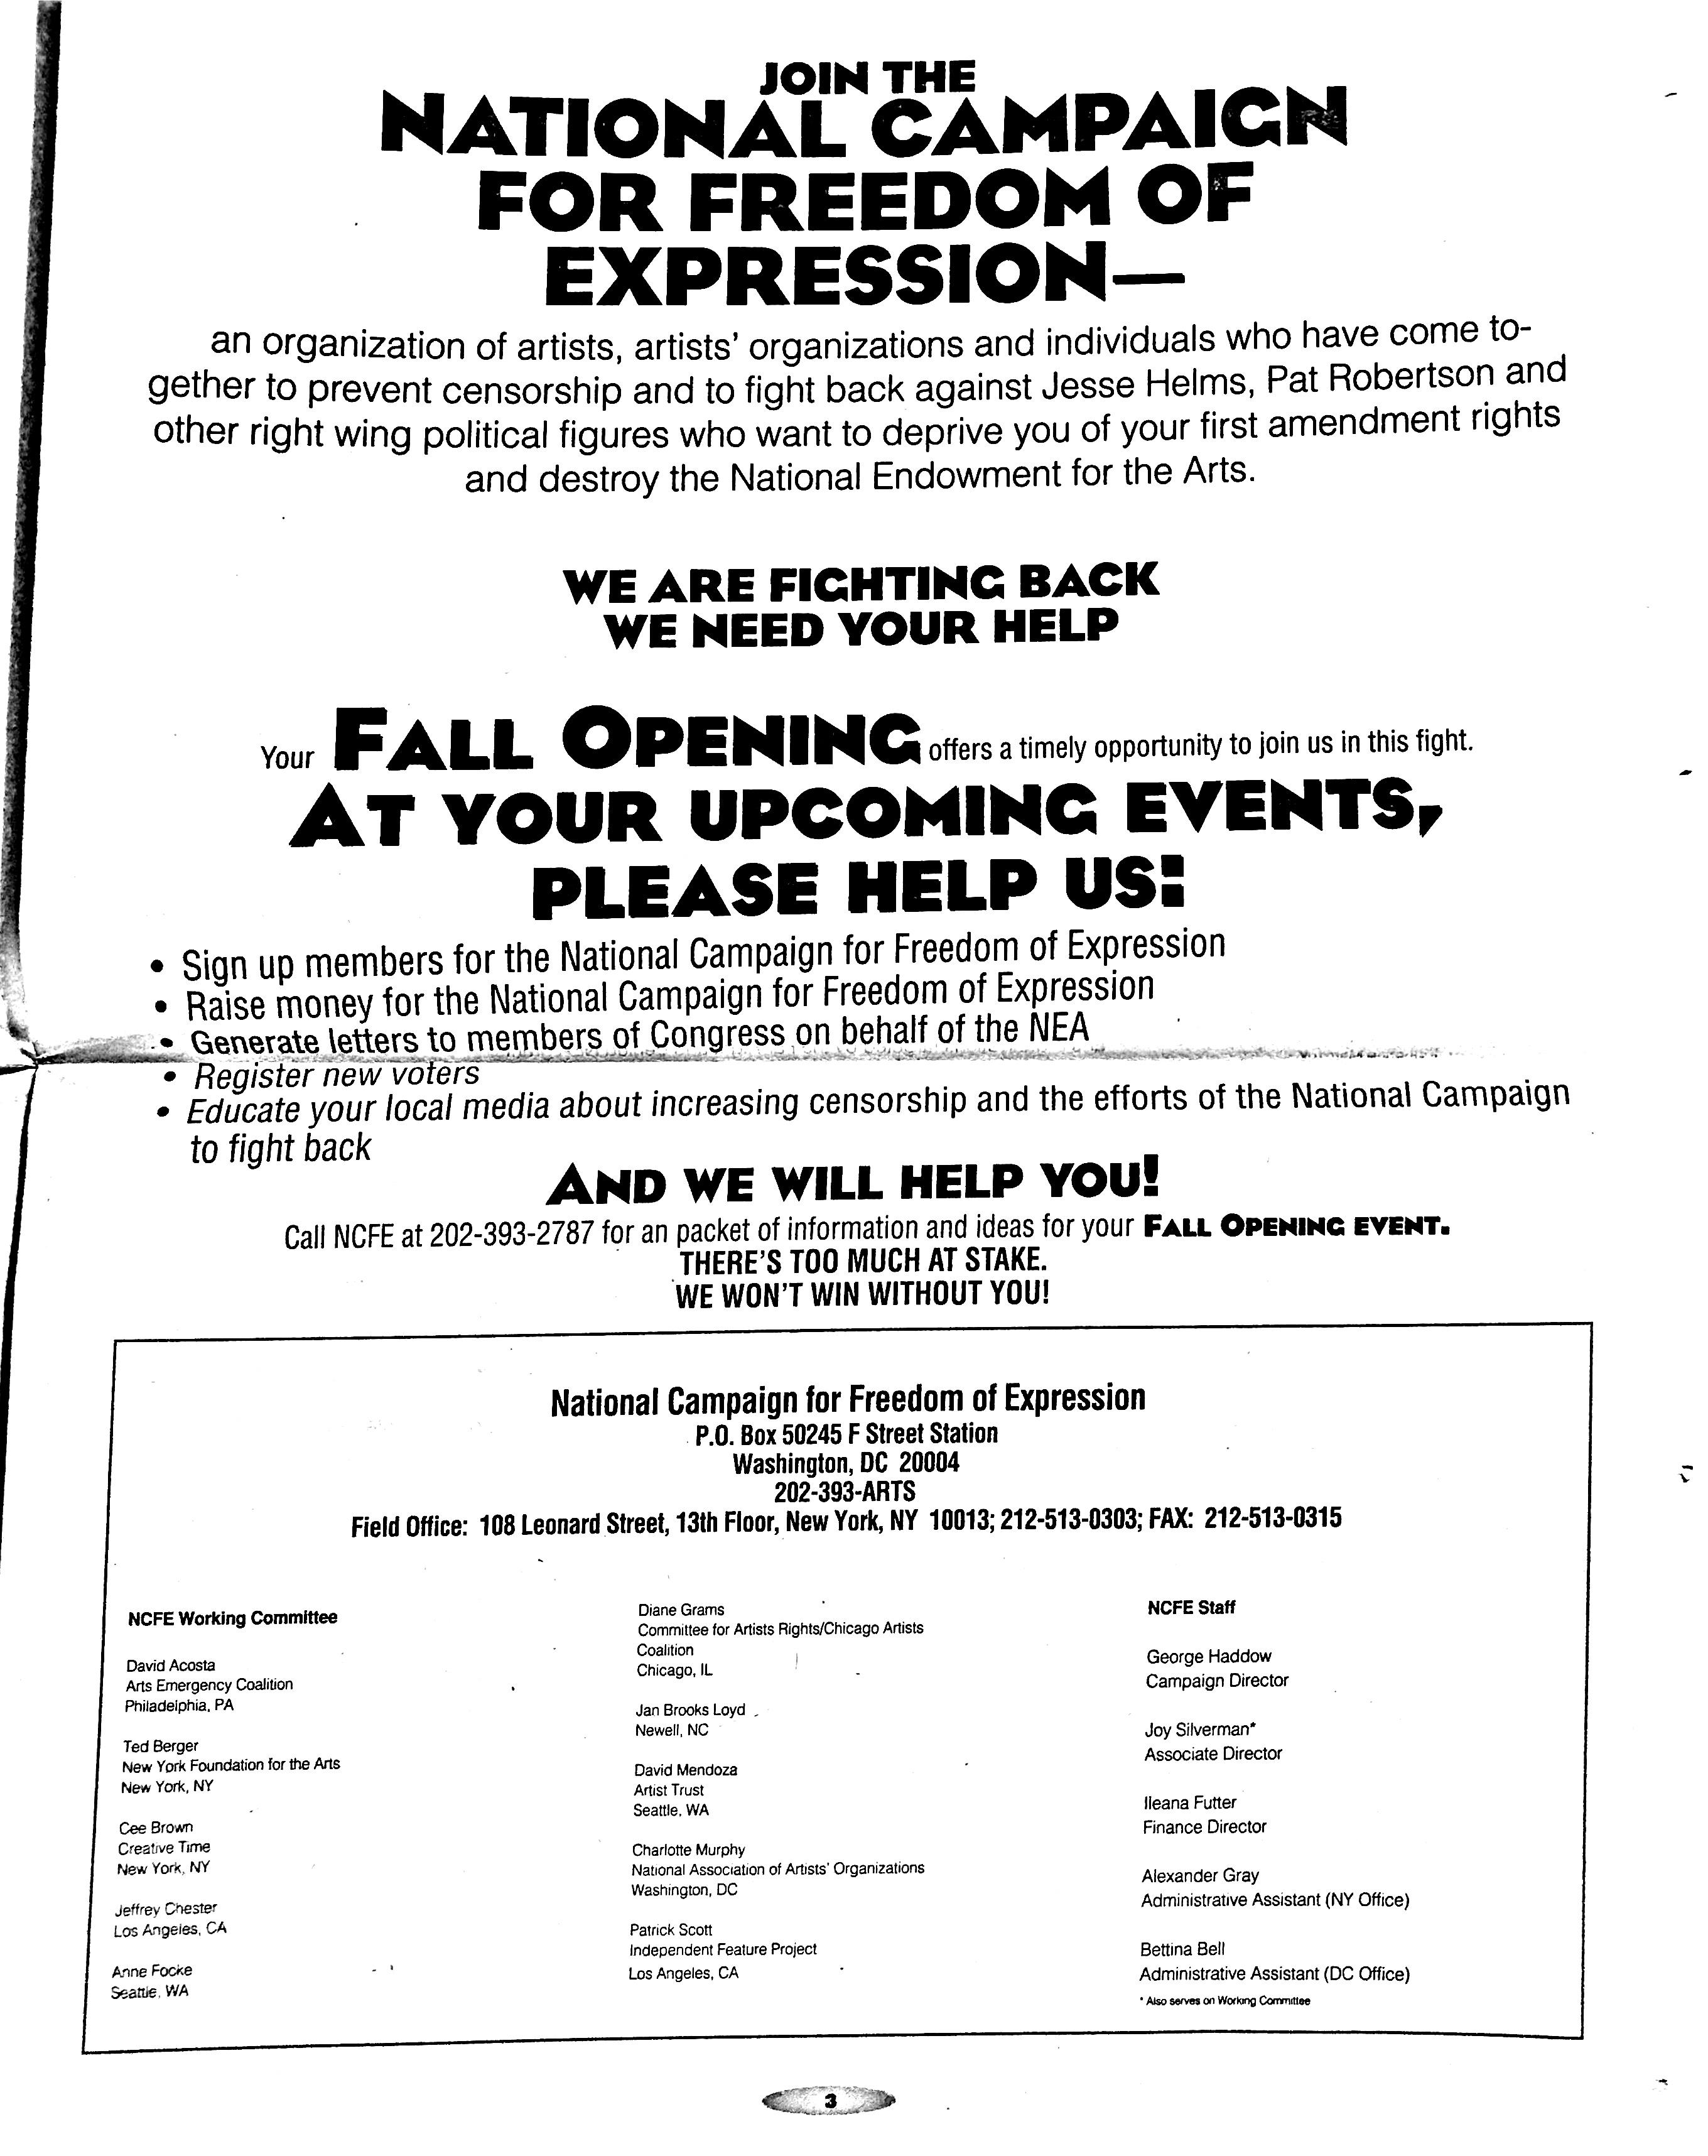 Summer 1990 - NAAO Bulletin Page 3.jpg